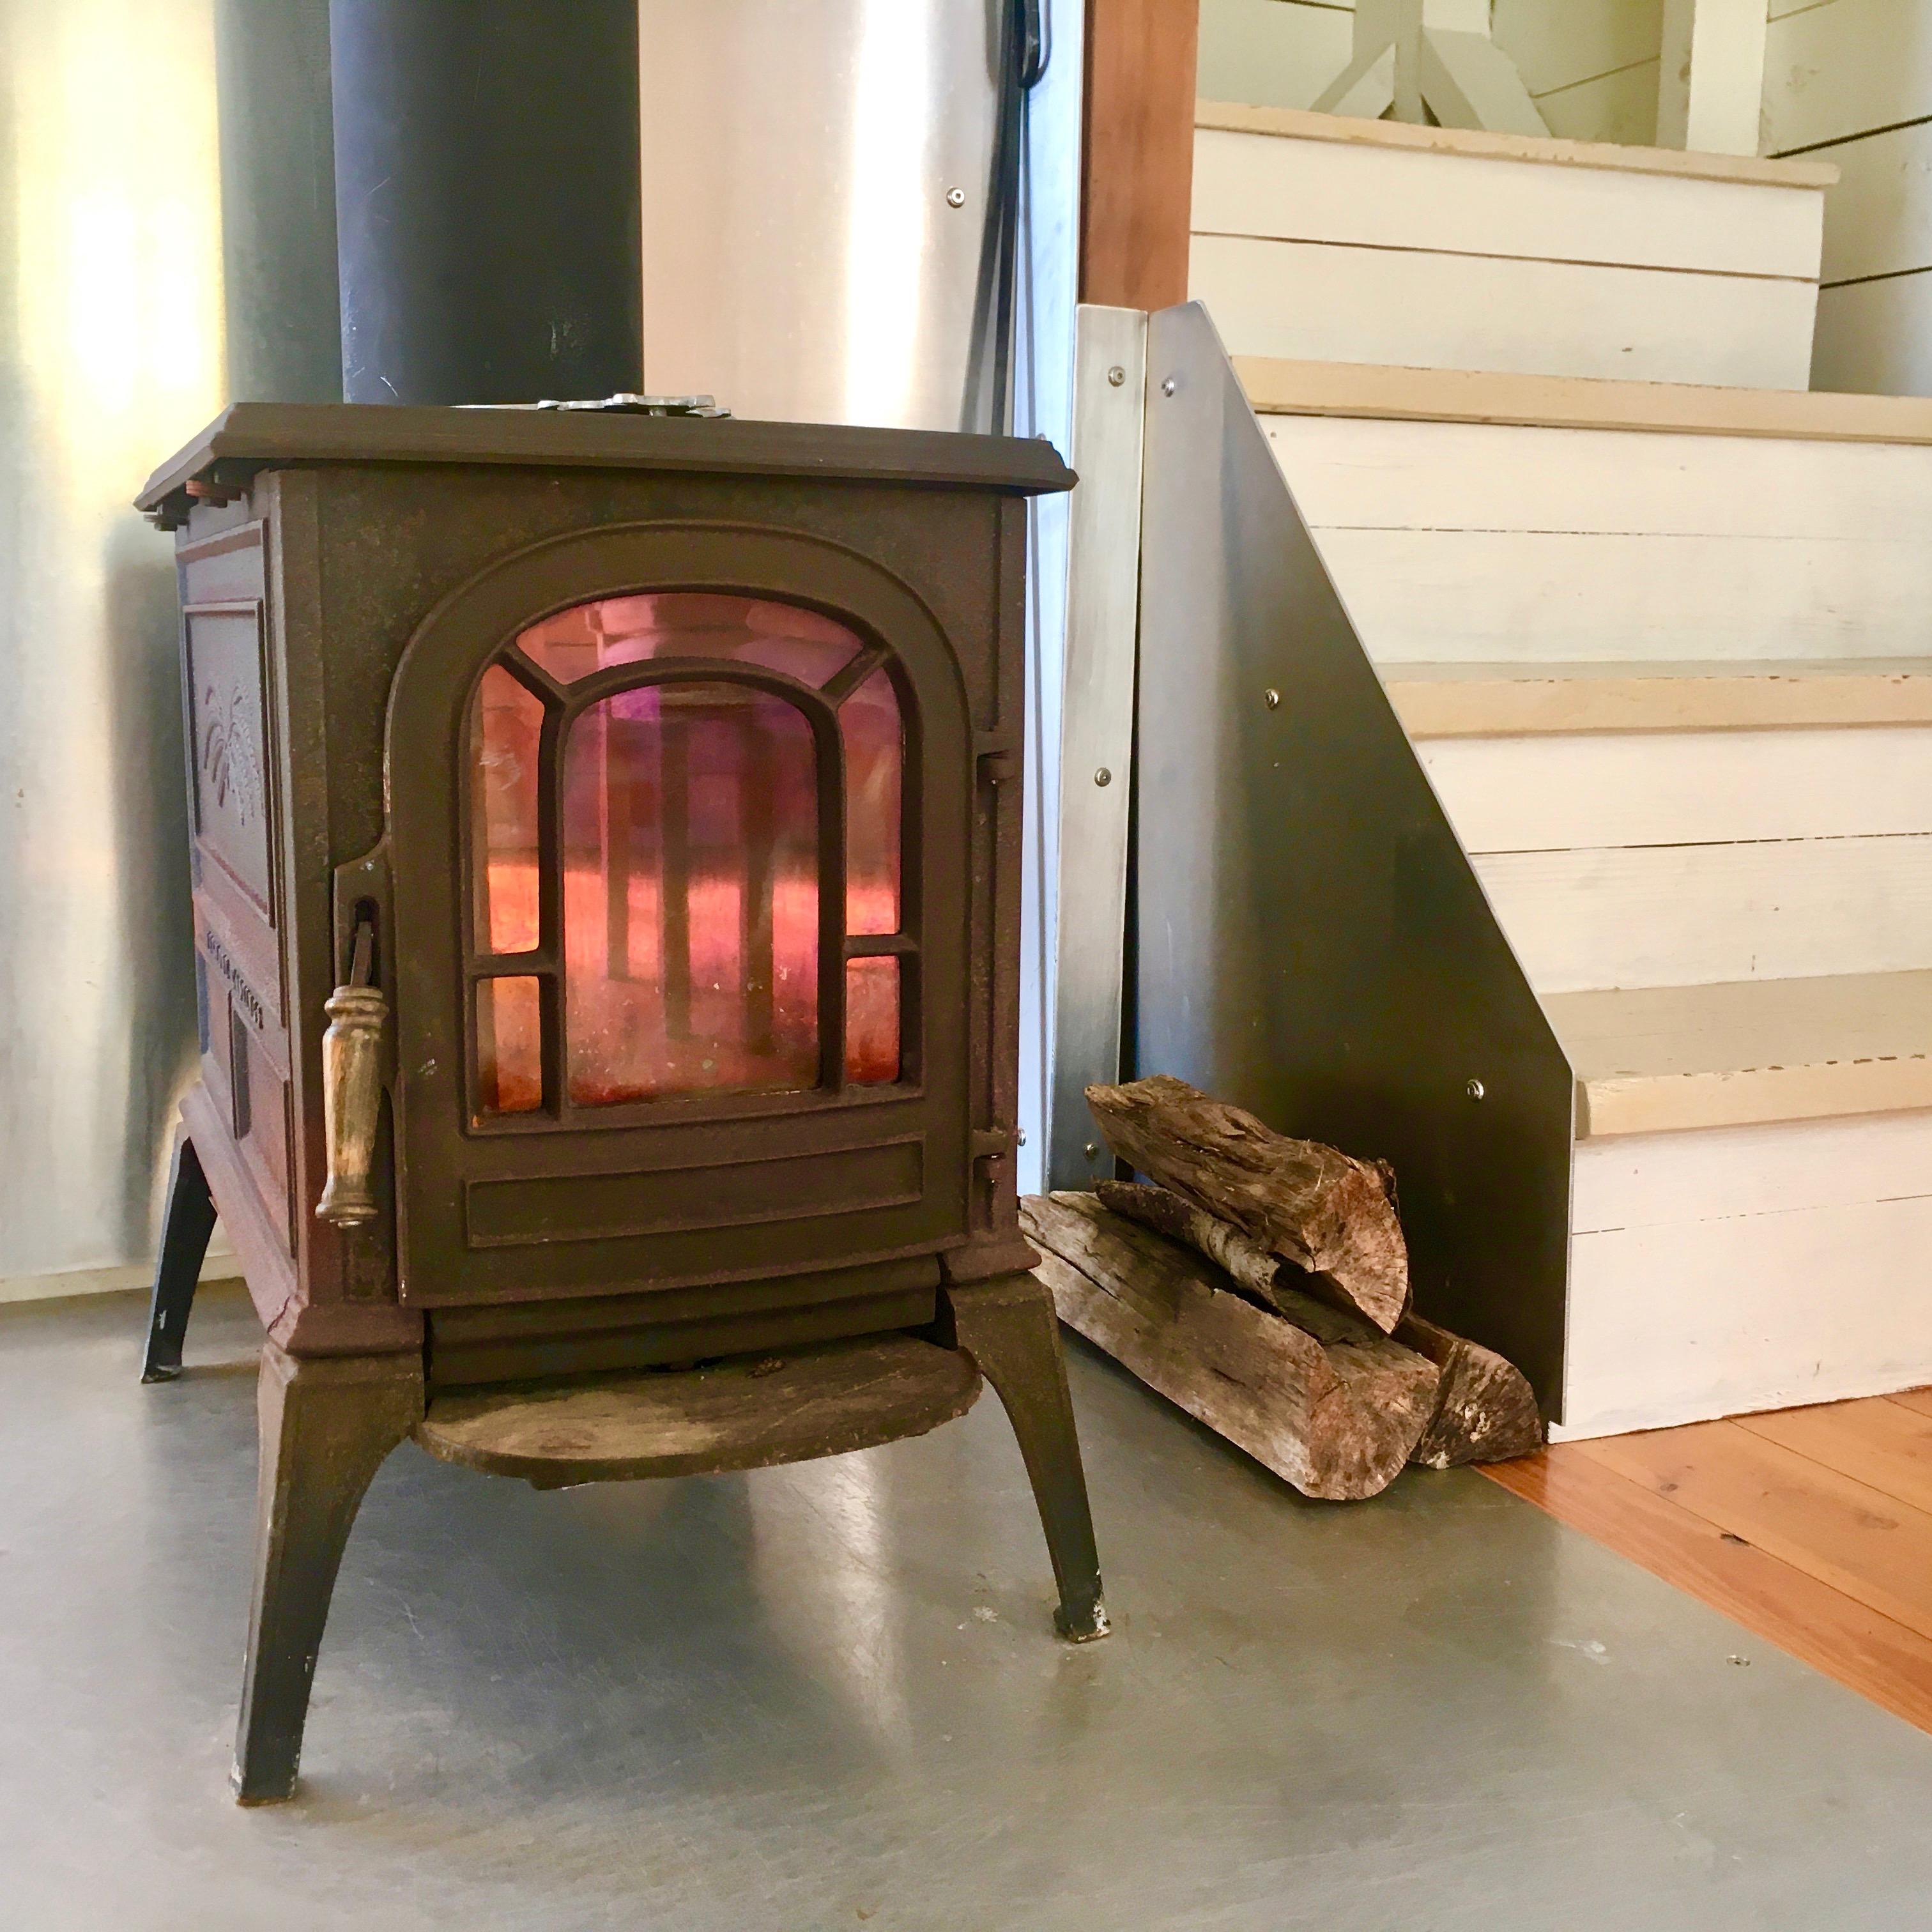 Vermont Castings stove, deepBlueSea